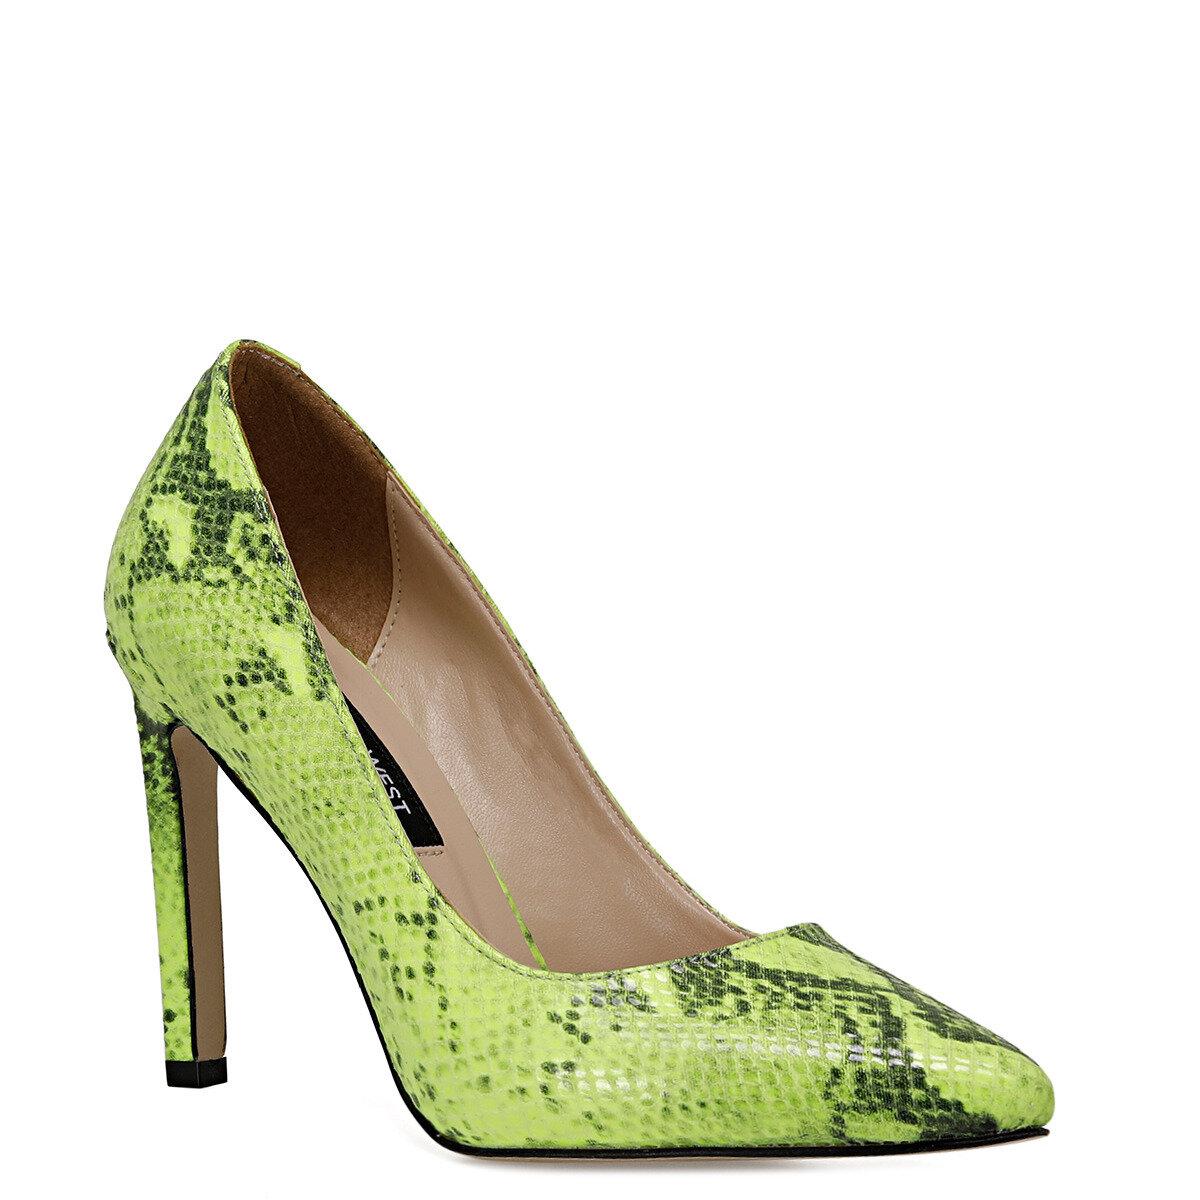 TANITA7 Neon Yeşil Kadın Stiletto